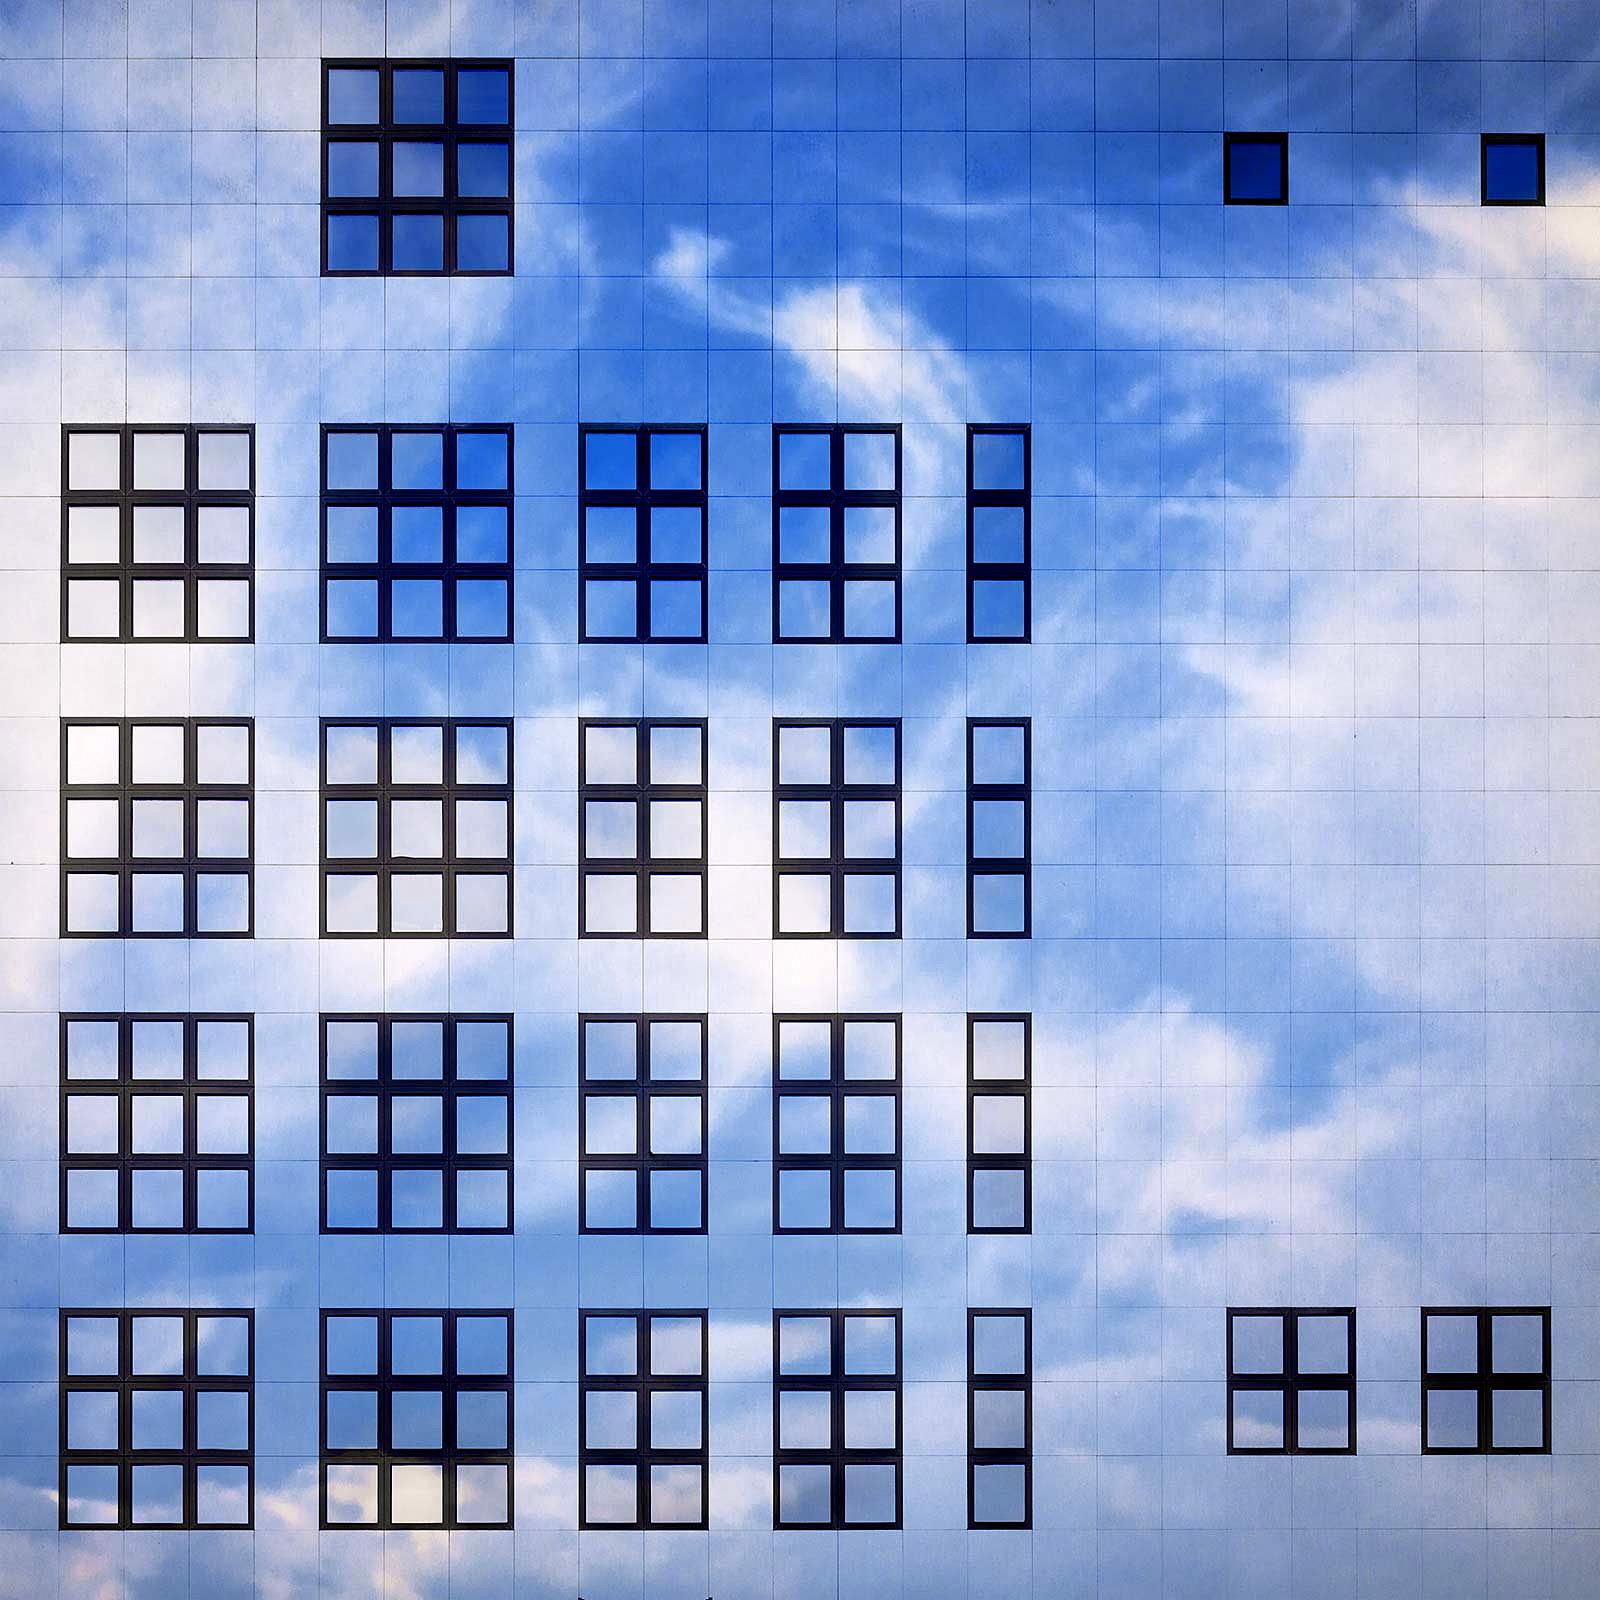 Windows II by Markus Studtmann